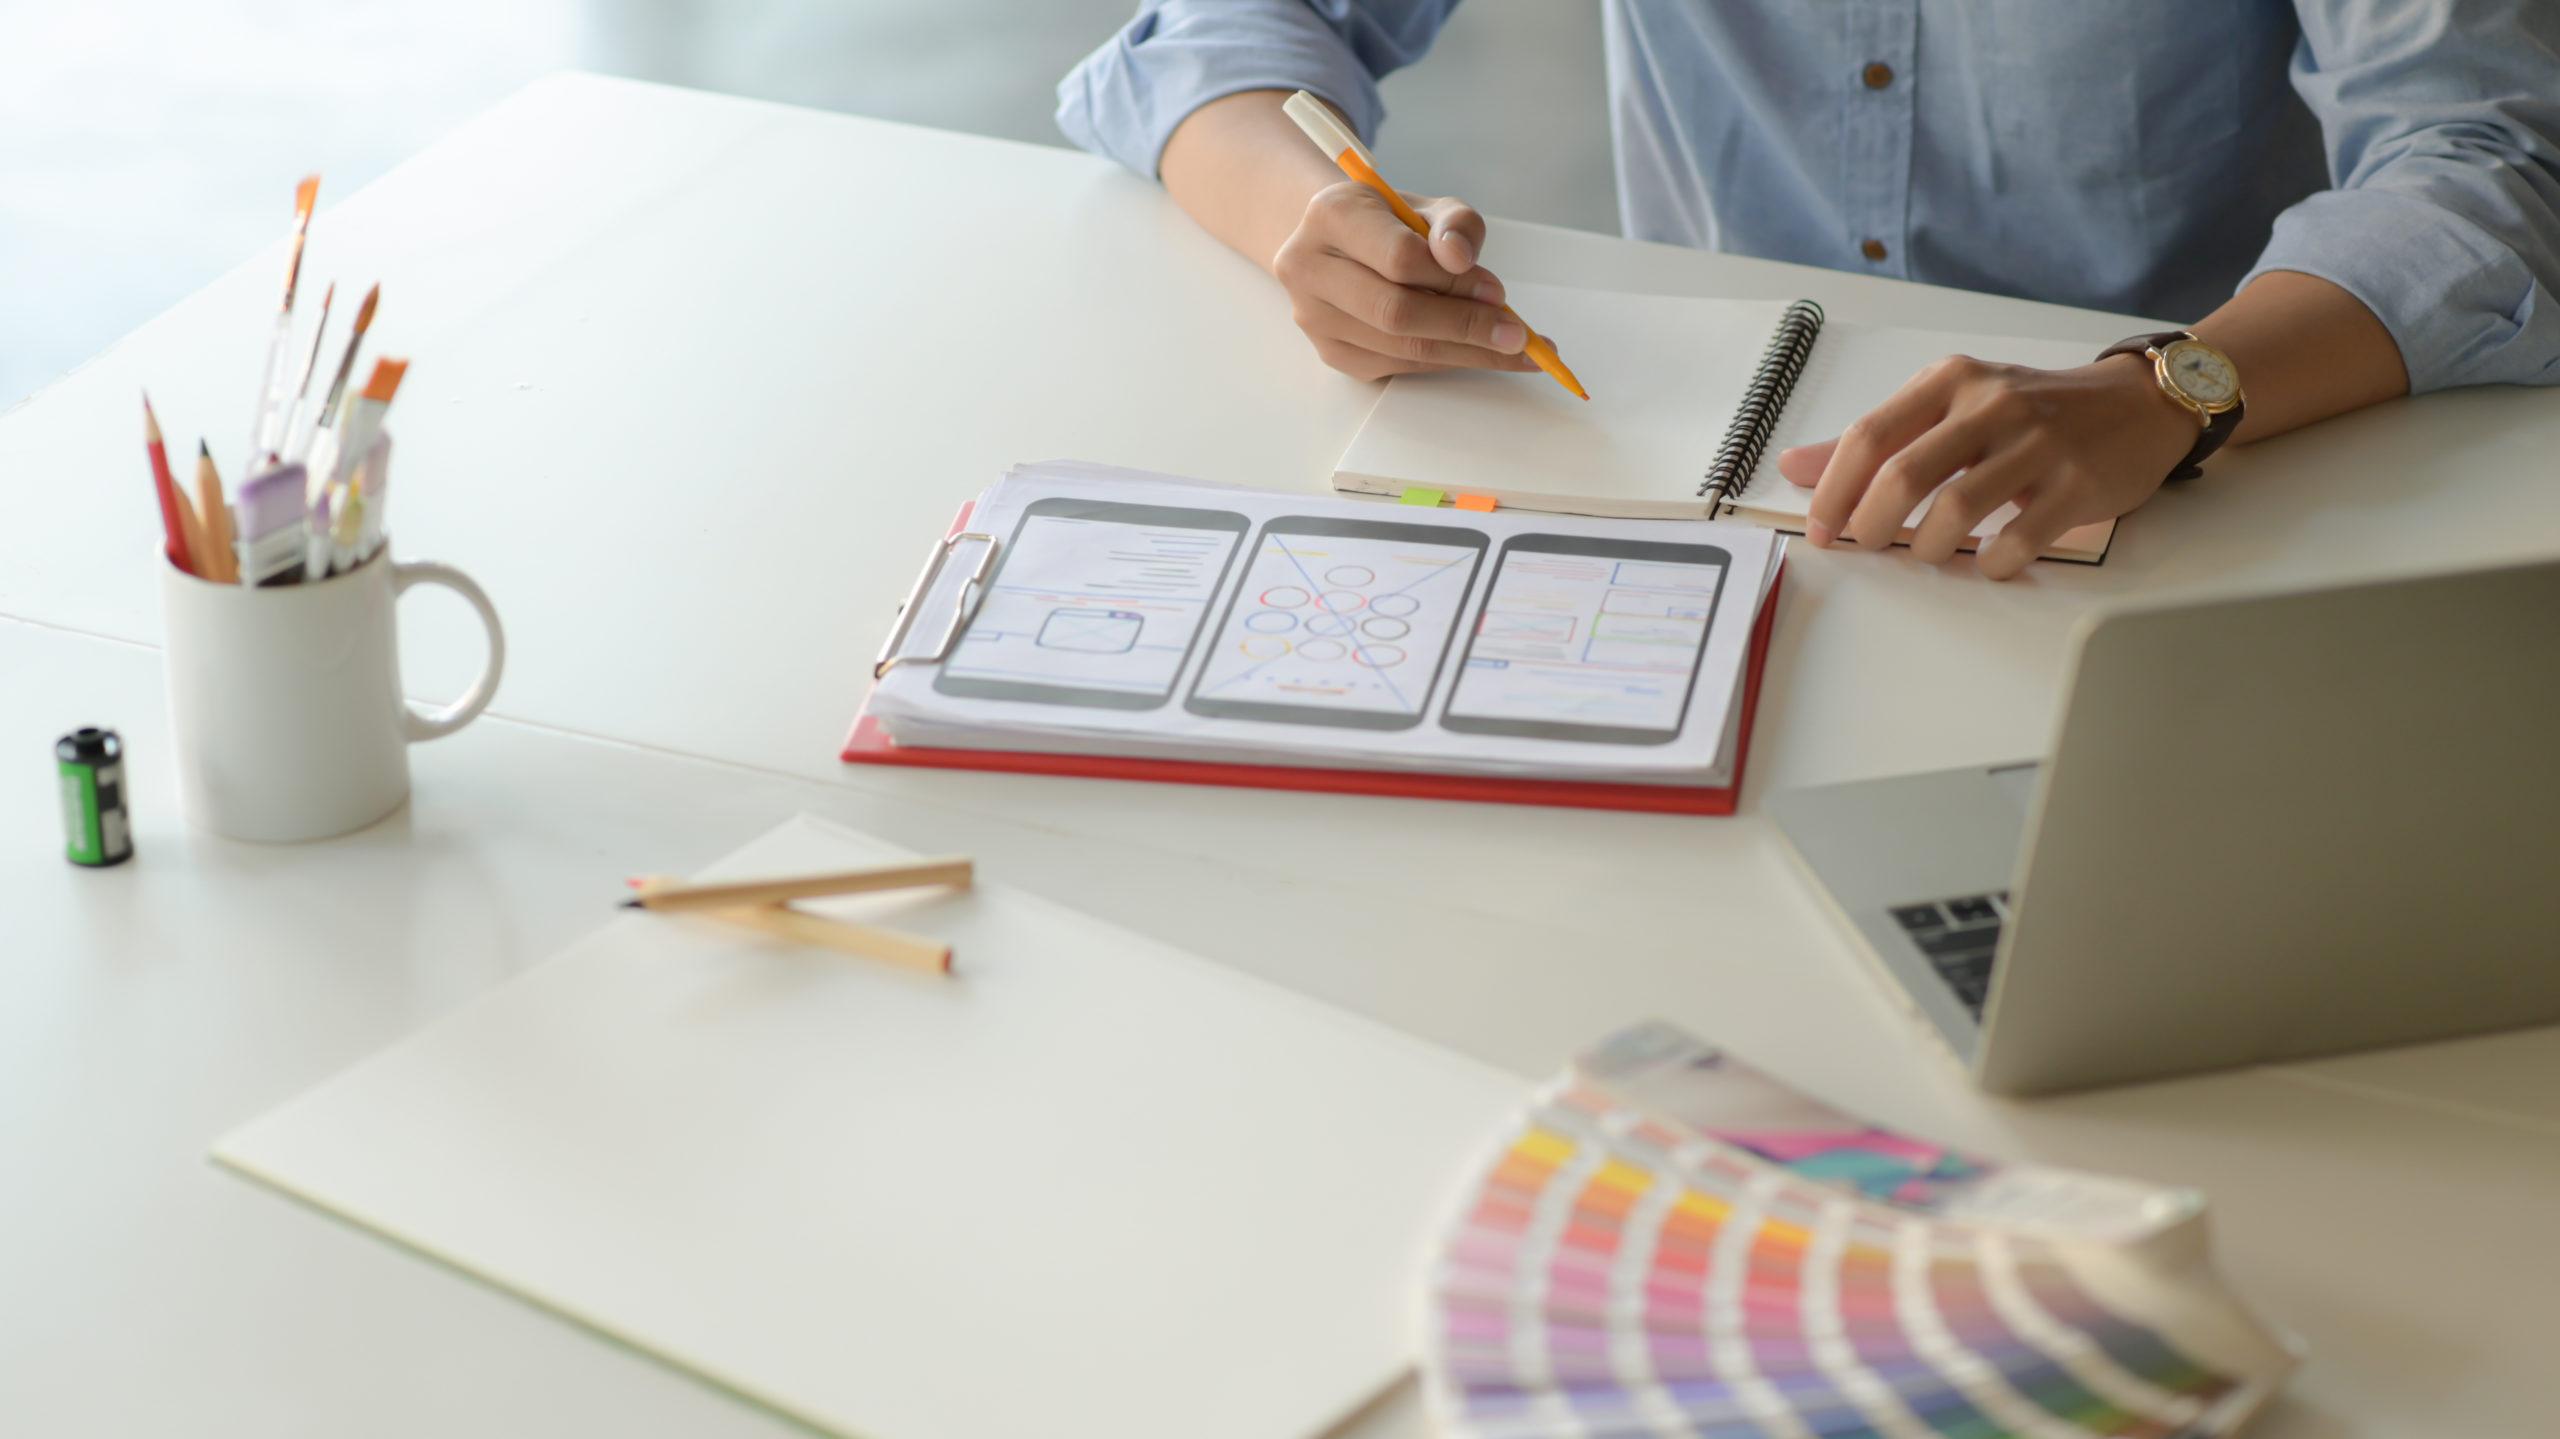 Le Process design sprint